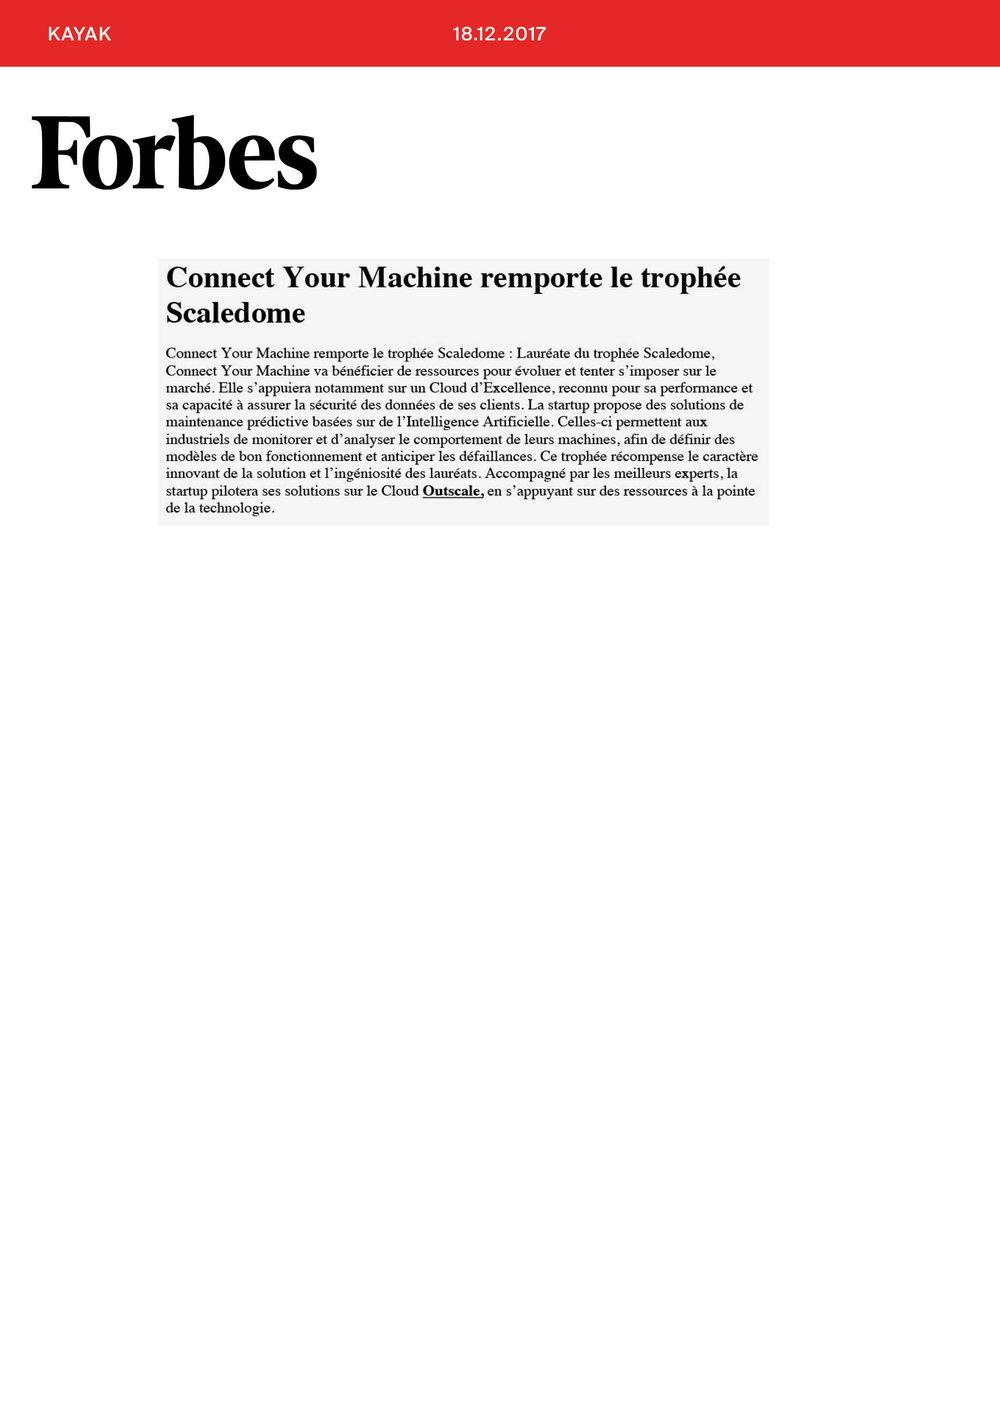 BOOKMEDIA_DEC30.jpg